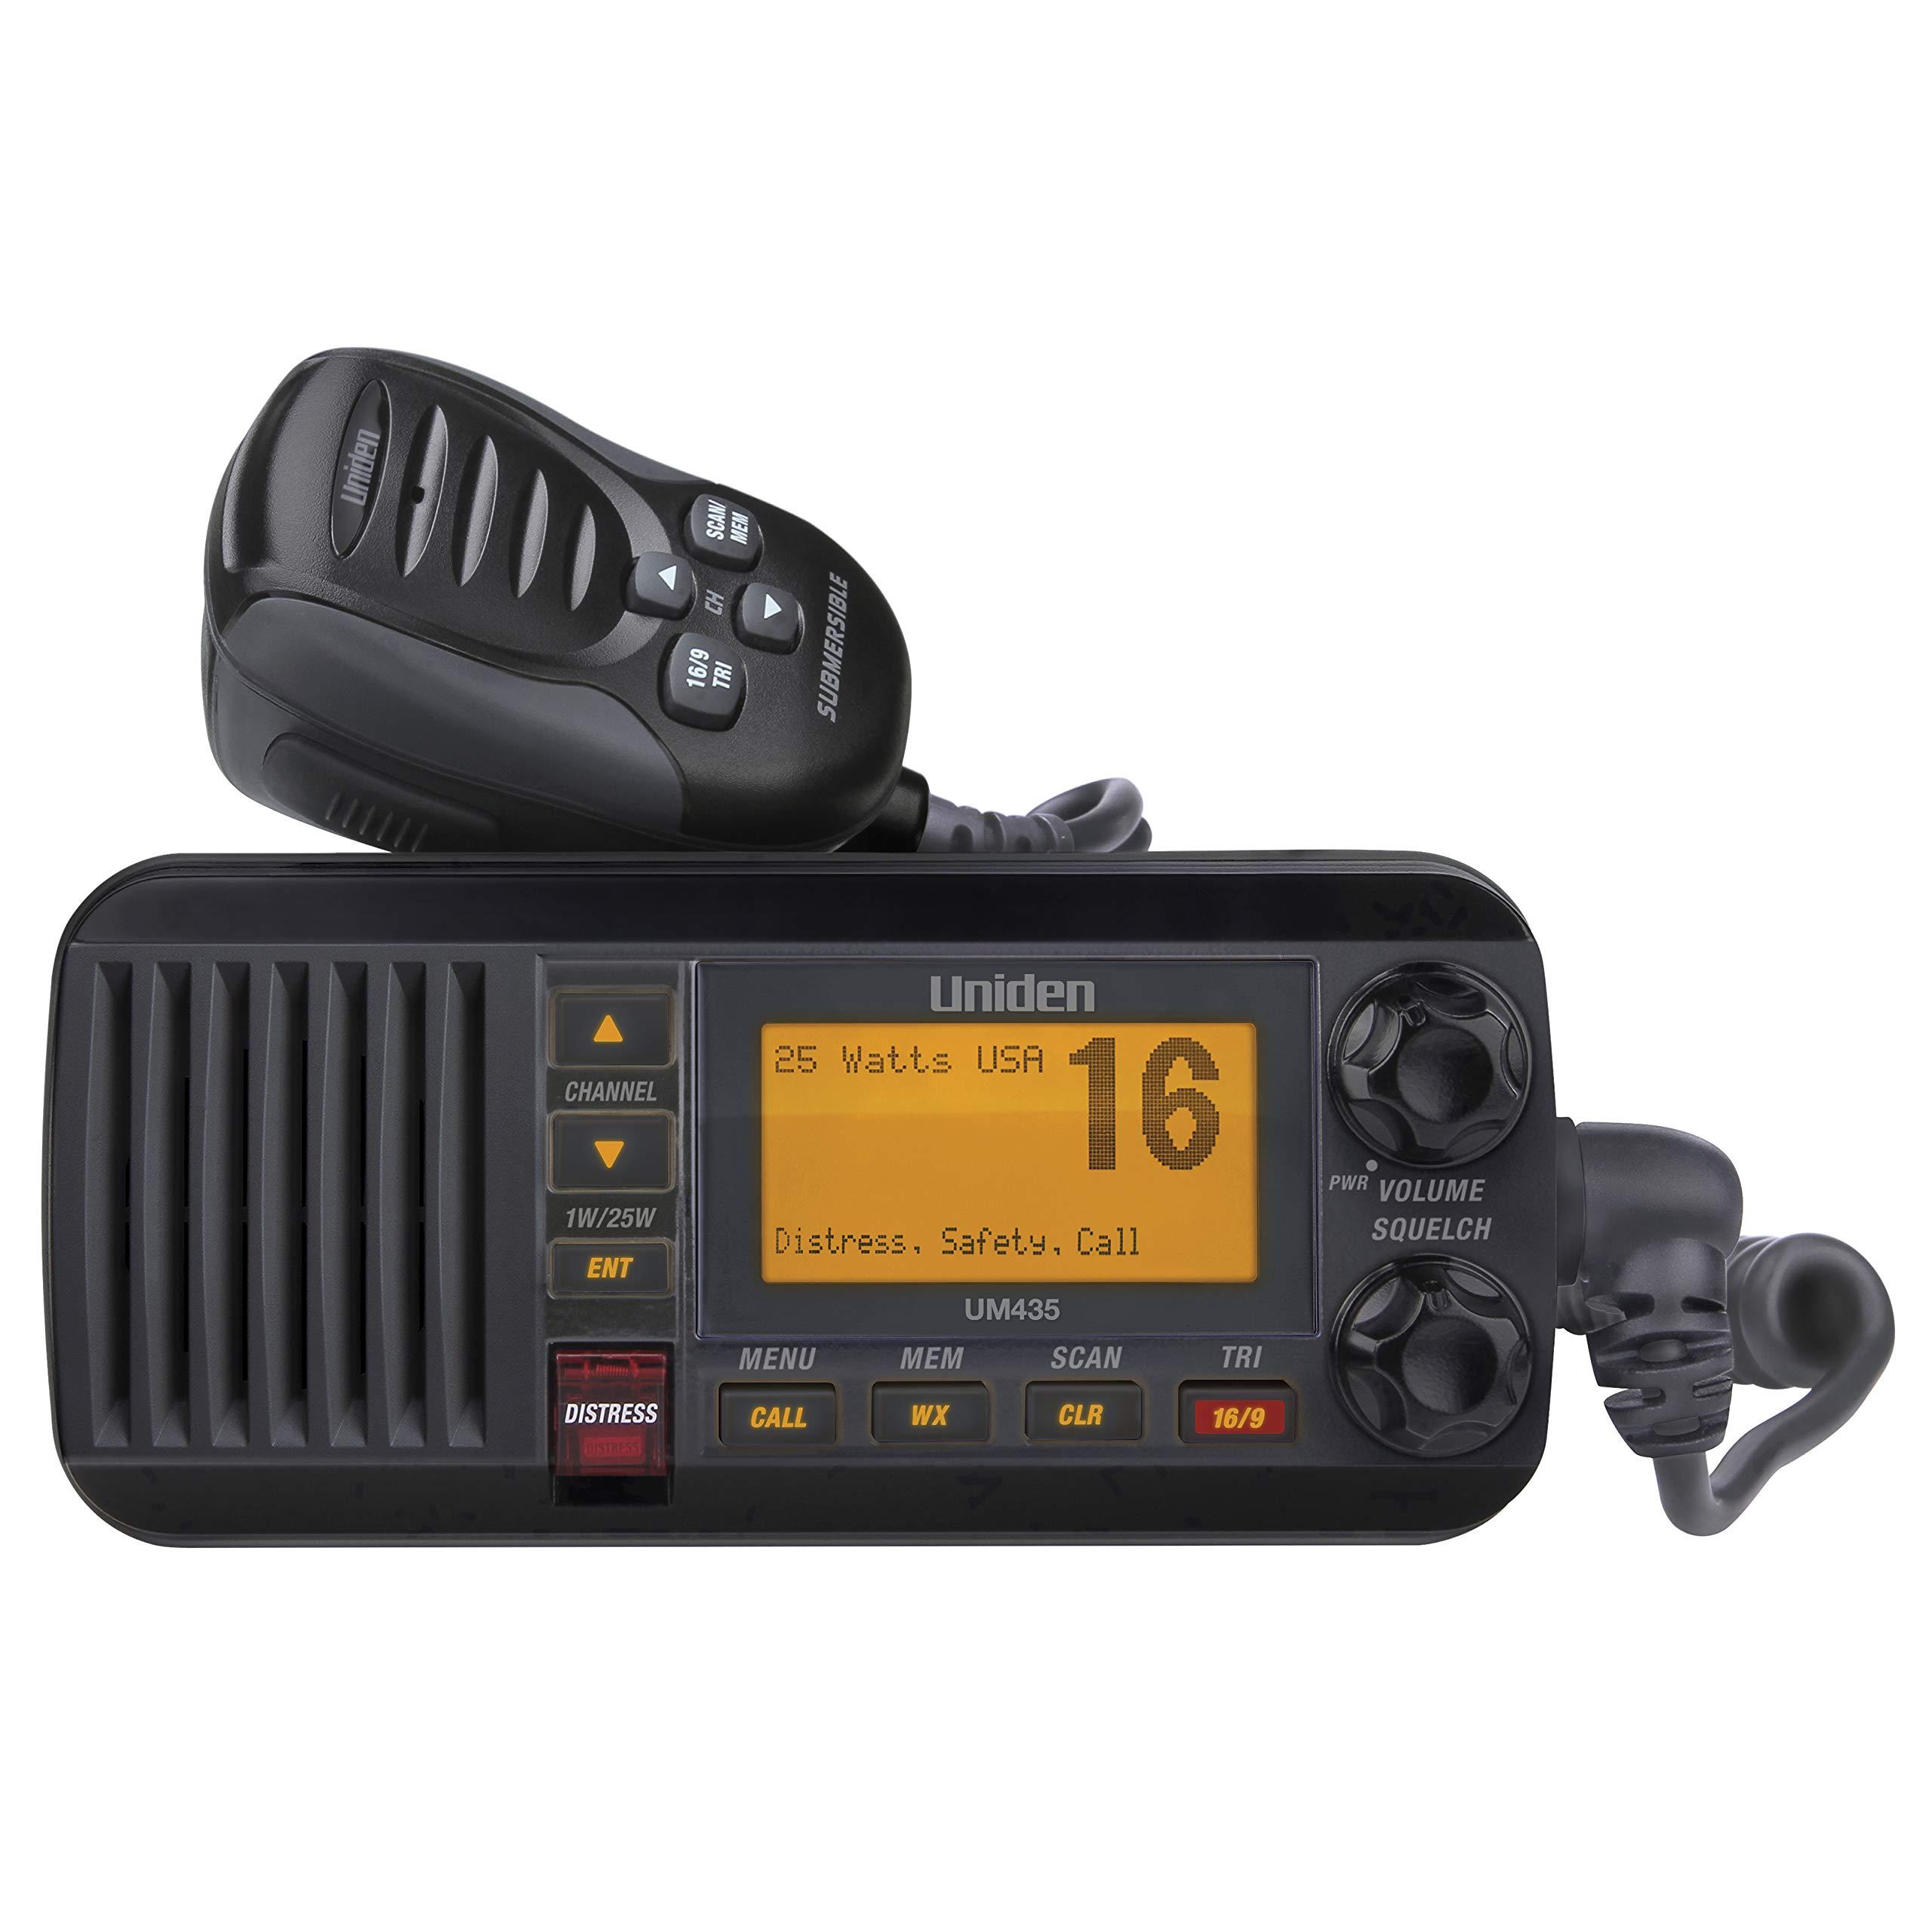 Uniden UM435BK Advanced Fixed Mount VHF Marine Radio, All USA/International/Canadian Marine Channels including new 4-Digit, CDN ''B'' Channels, 1 Watt/25 Watt Power, Waterproof IPX8 Submersible, Black